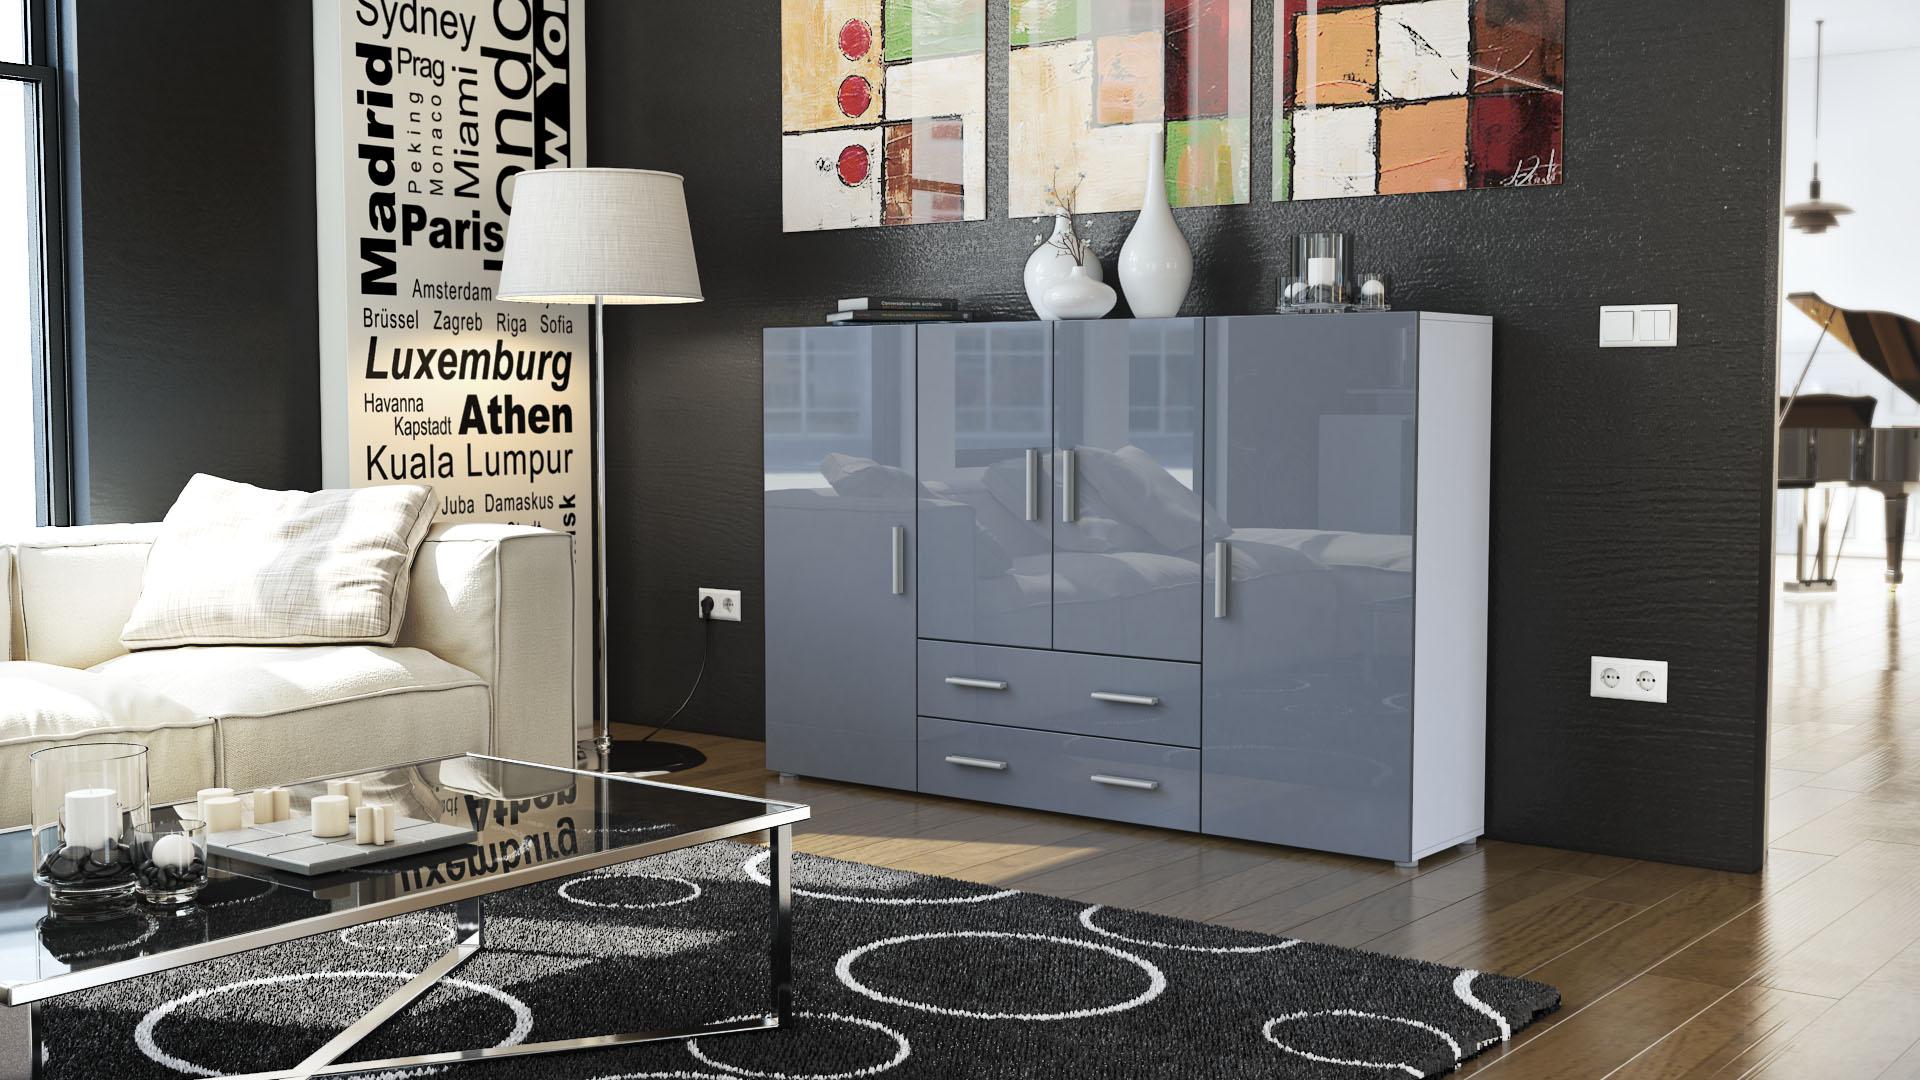 Home, Furniture & DIY > Furniture > Sideboards & Buffets